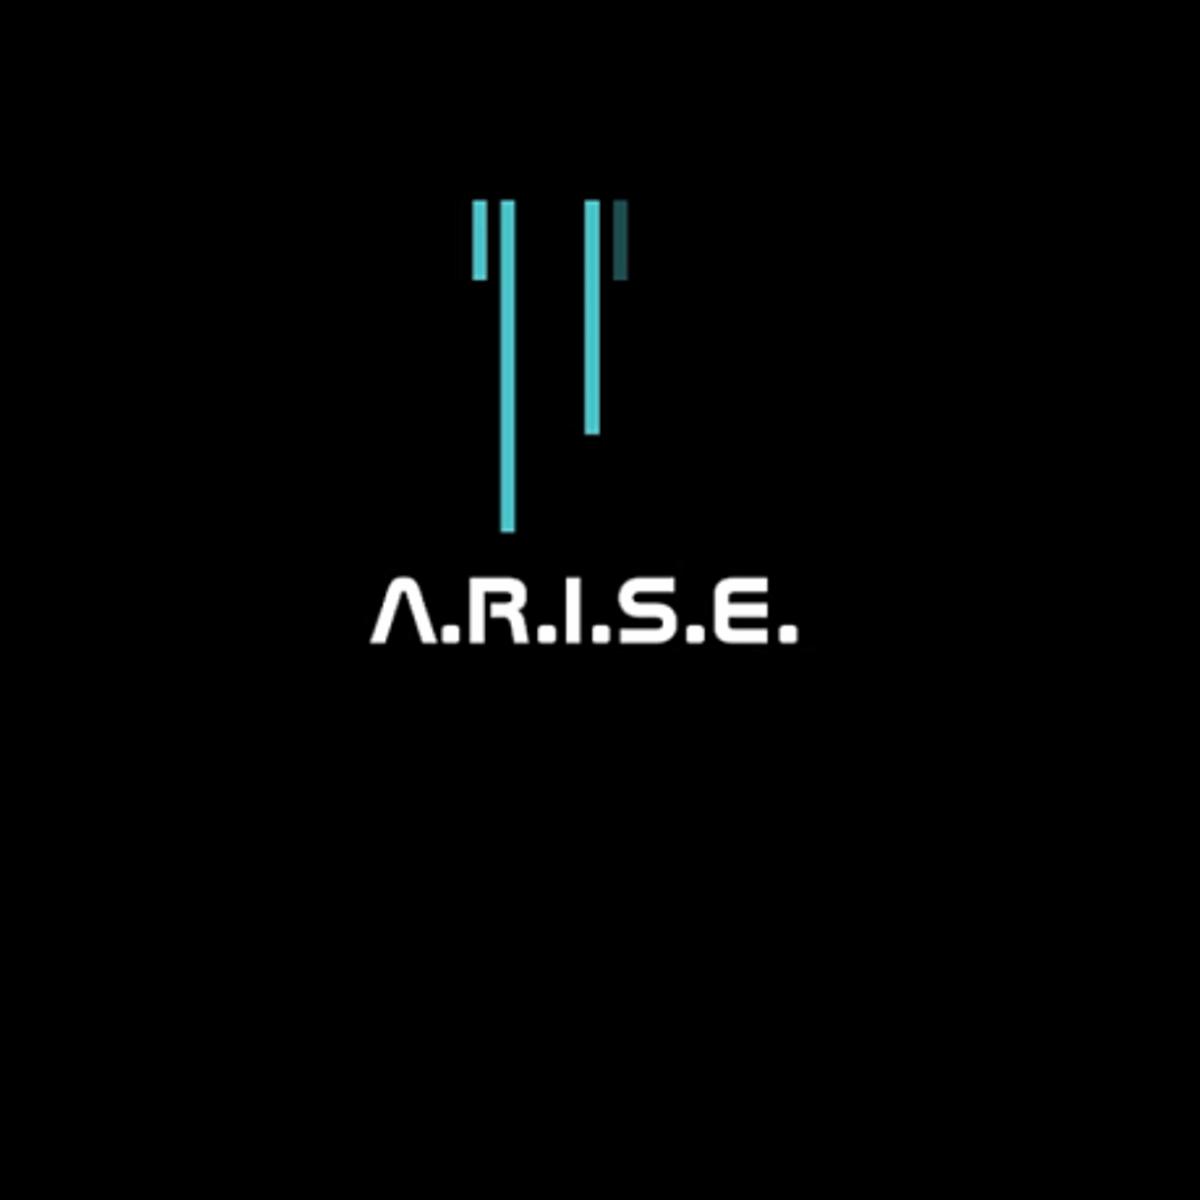 A R I S E  Sound Mod Alternatives and Similar Apps